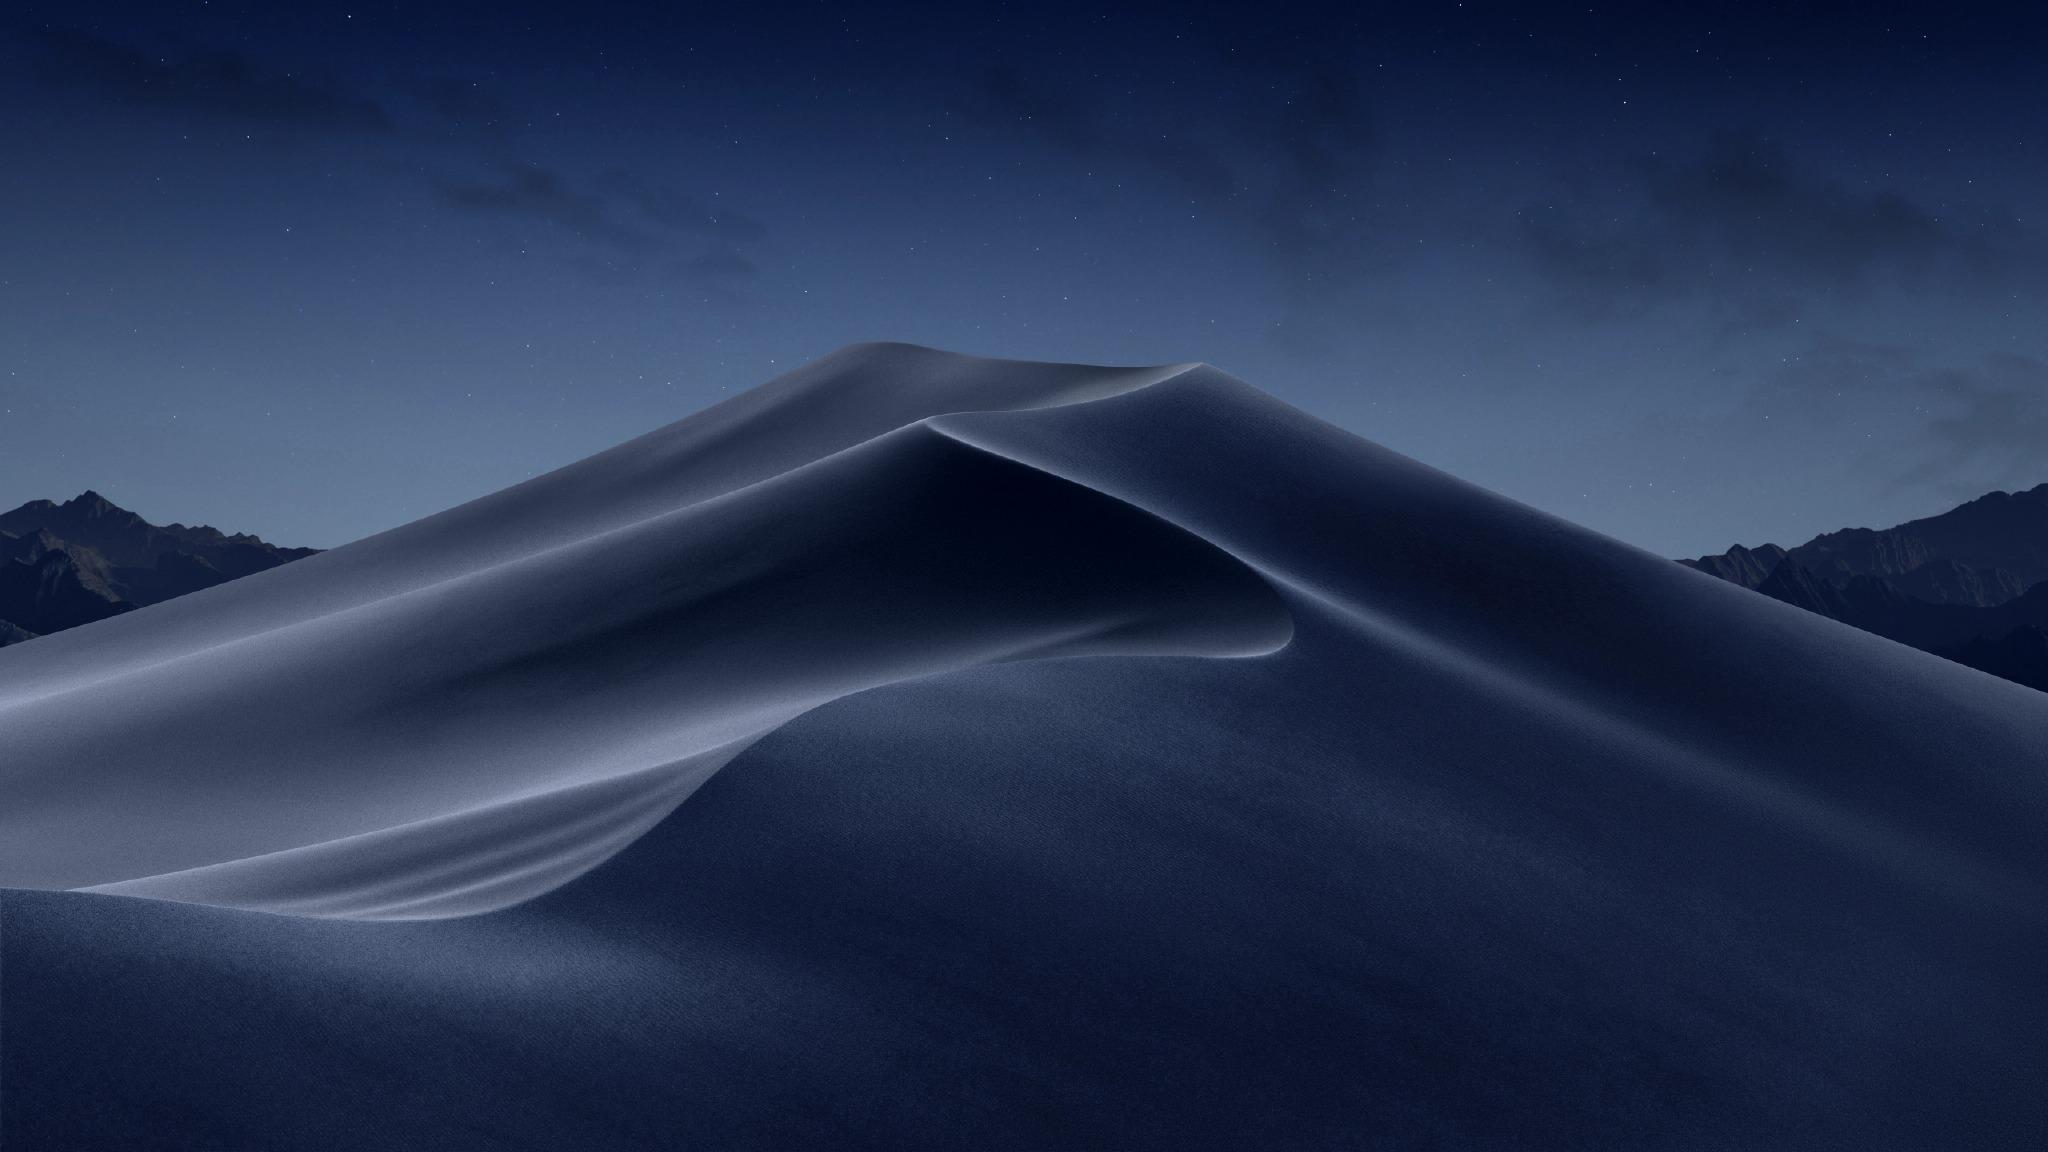 MacOS Mojave 全套自带沙漠壁纸